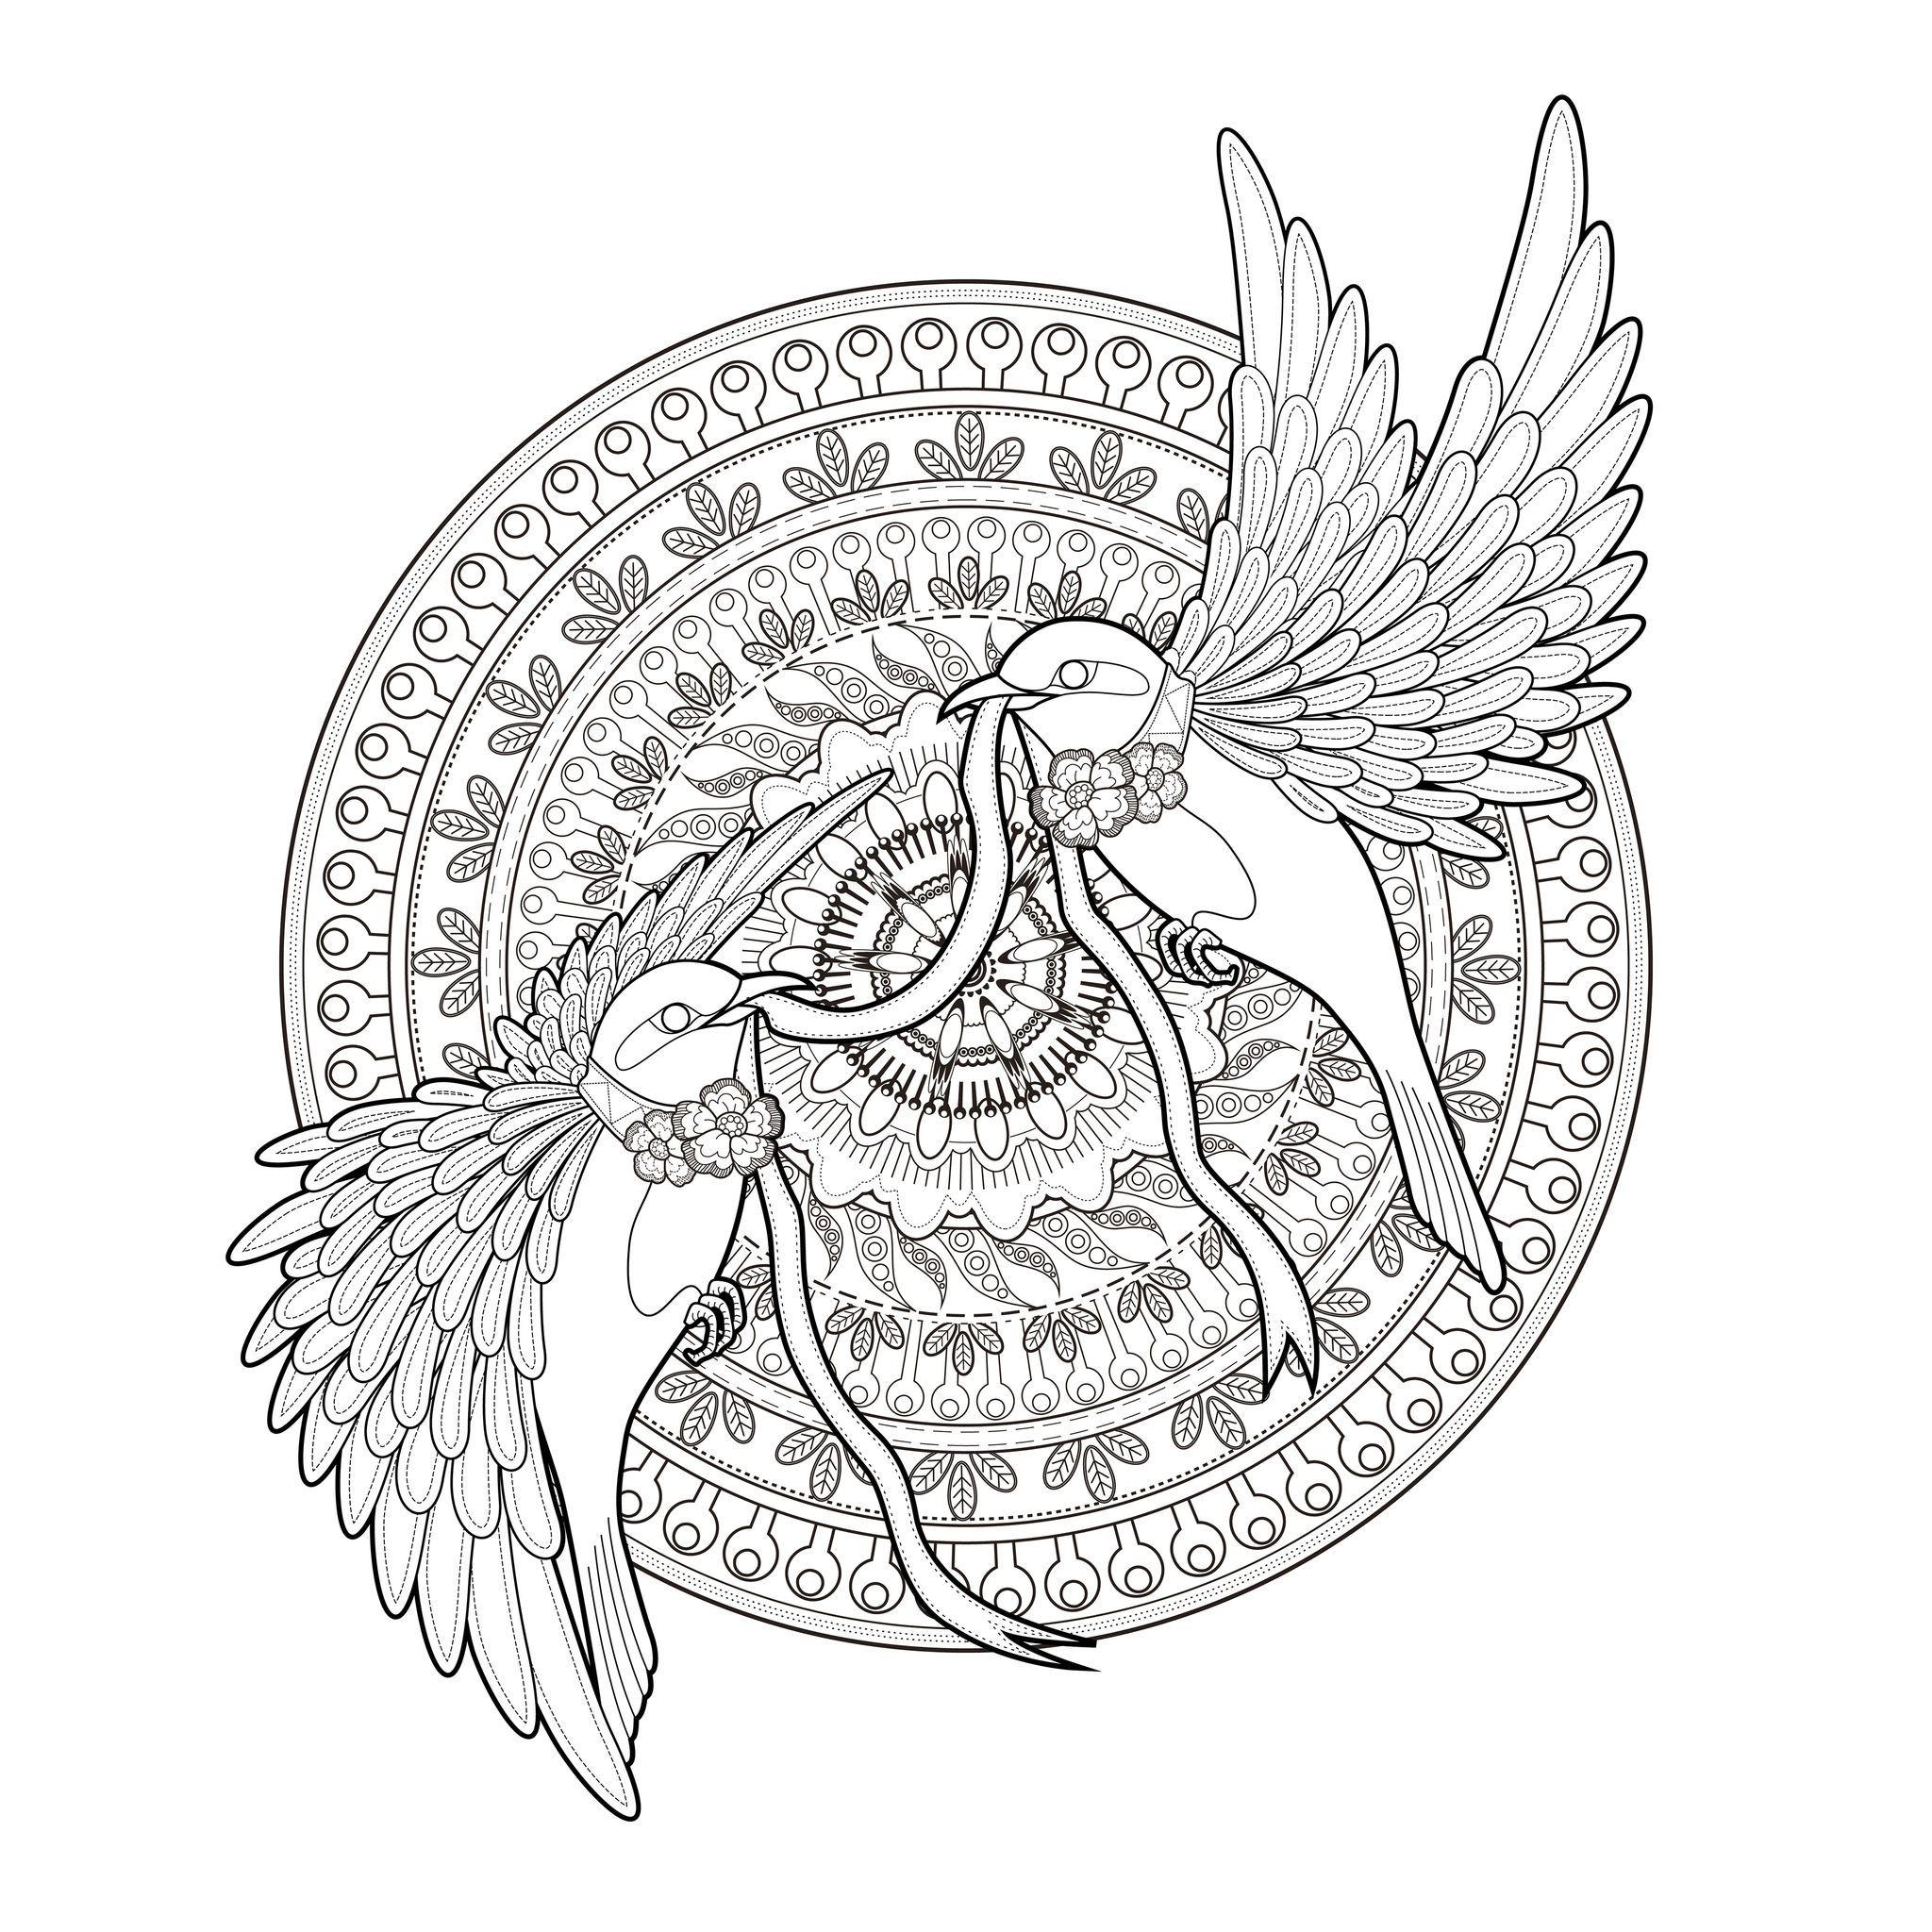 Mandala deux hirondelles et un ruban par kchung a partir - Mandalas adultes gratuits ...